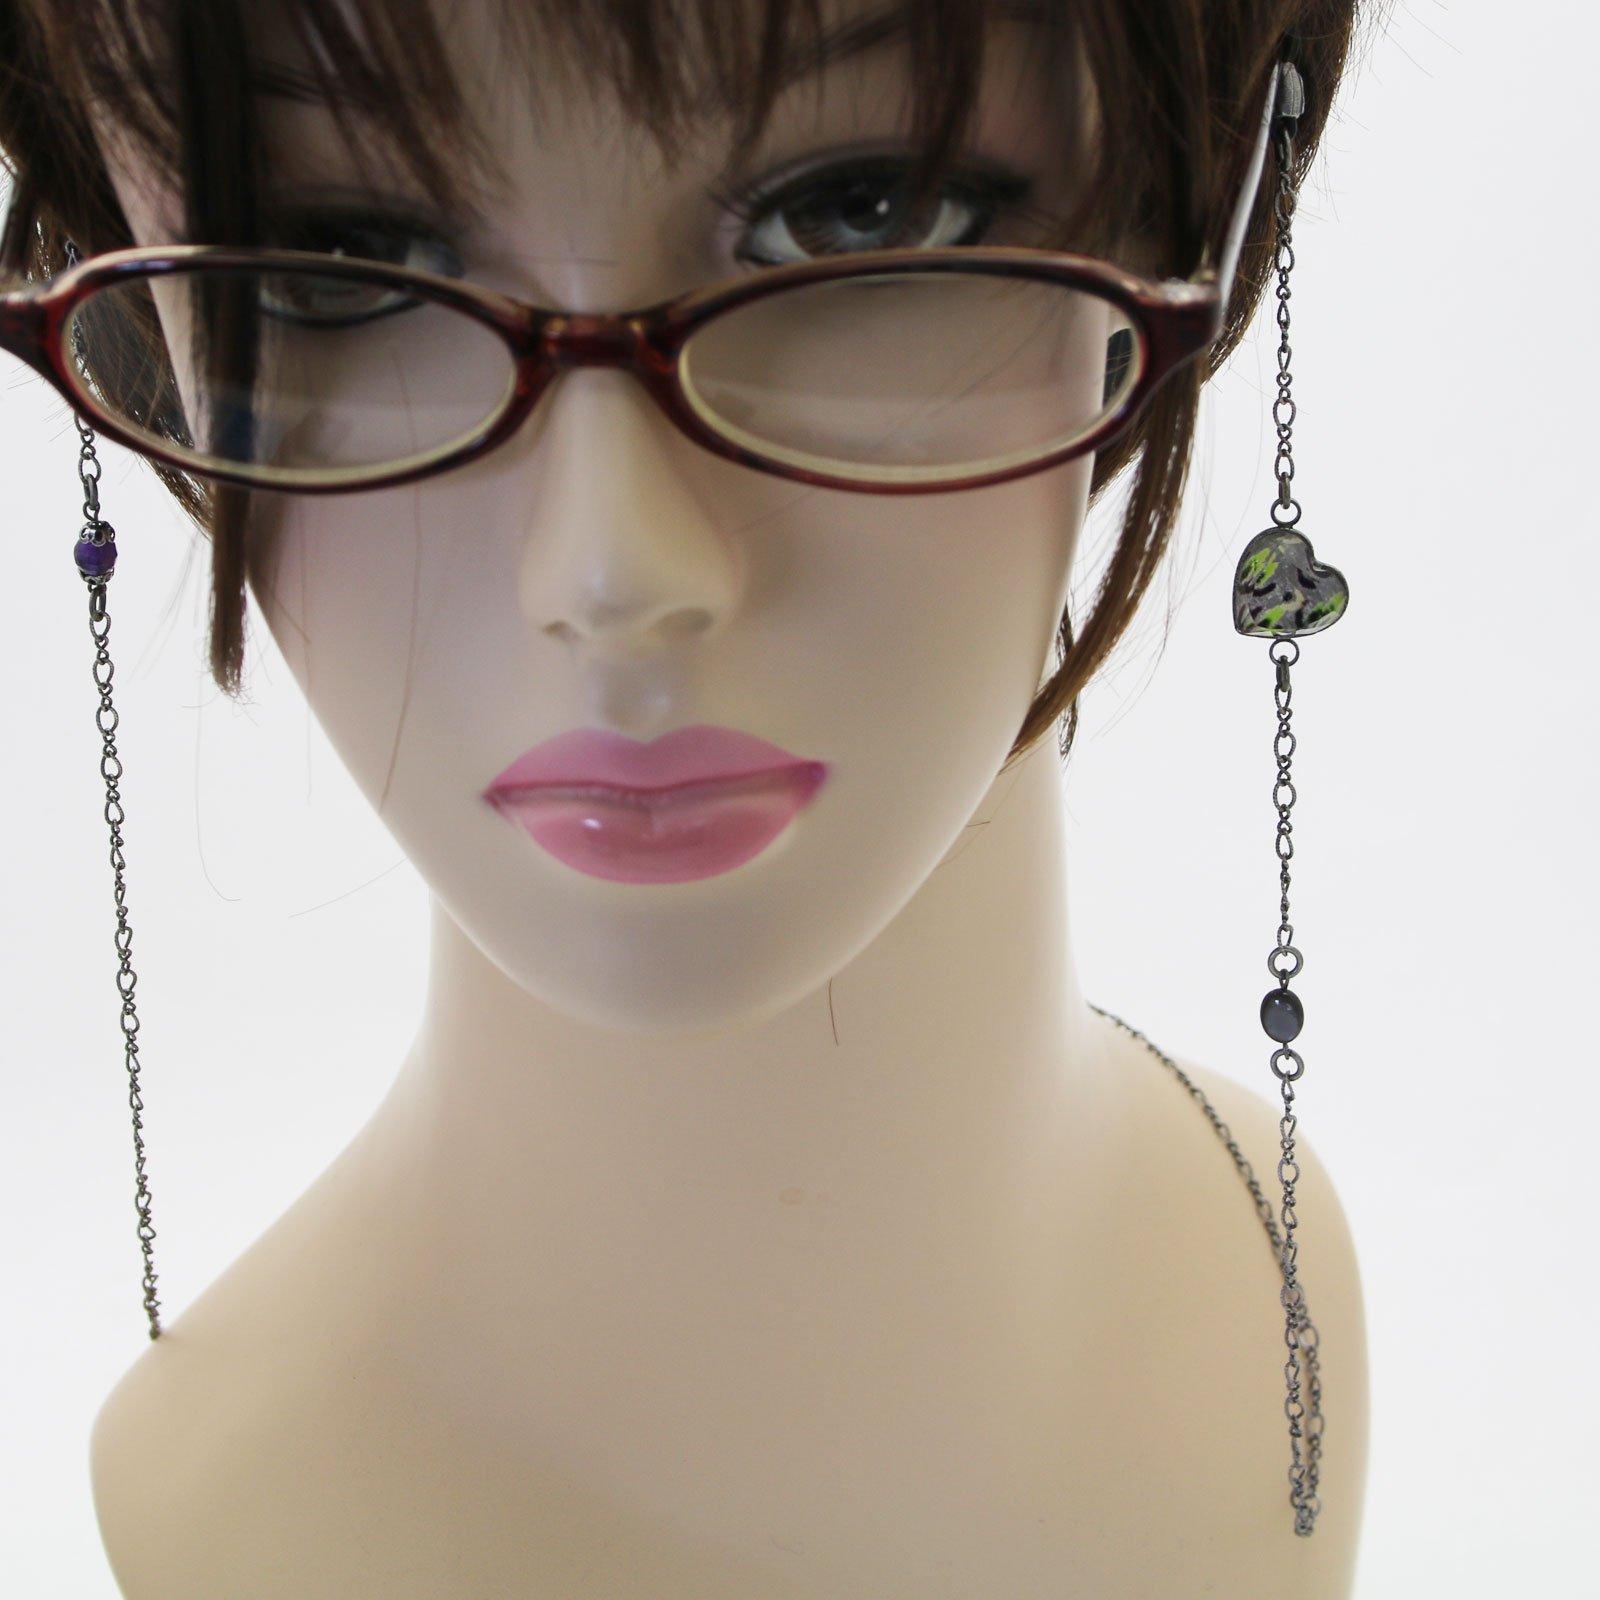 Tamarusan Eyewear Chain Heart Gray Shell Amethyst Unisex Eyeglasses Code by TAMARUSAN (Image #5)